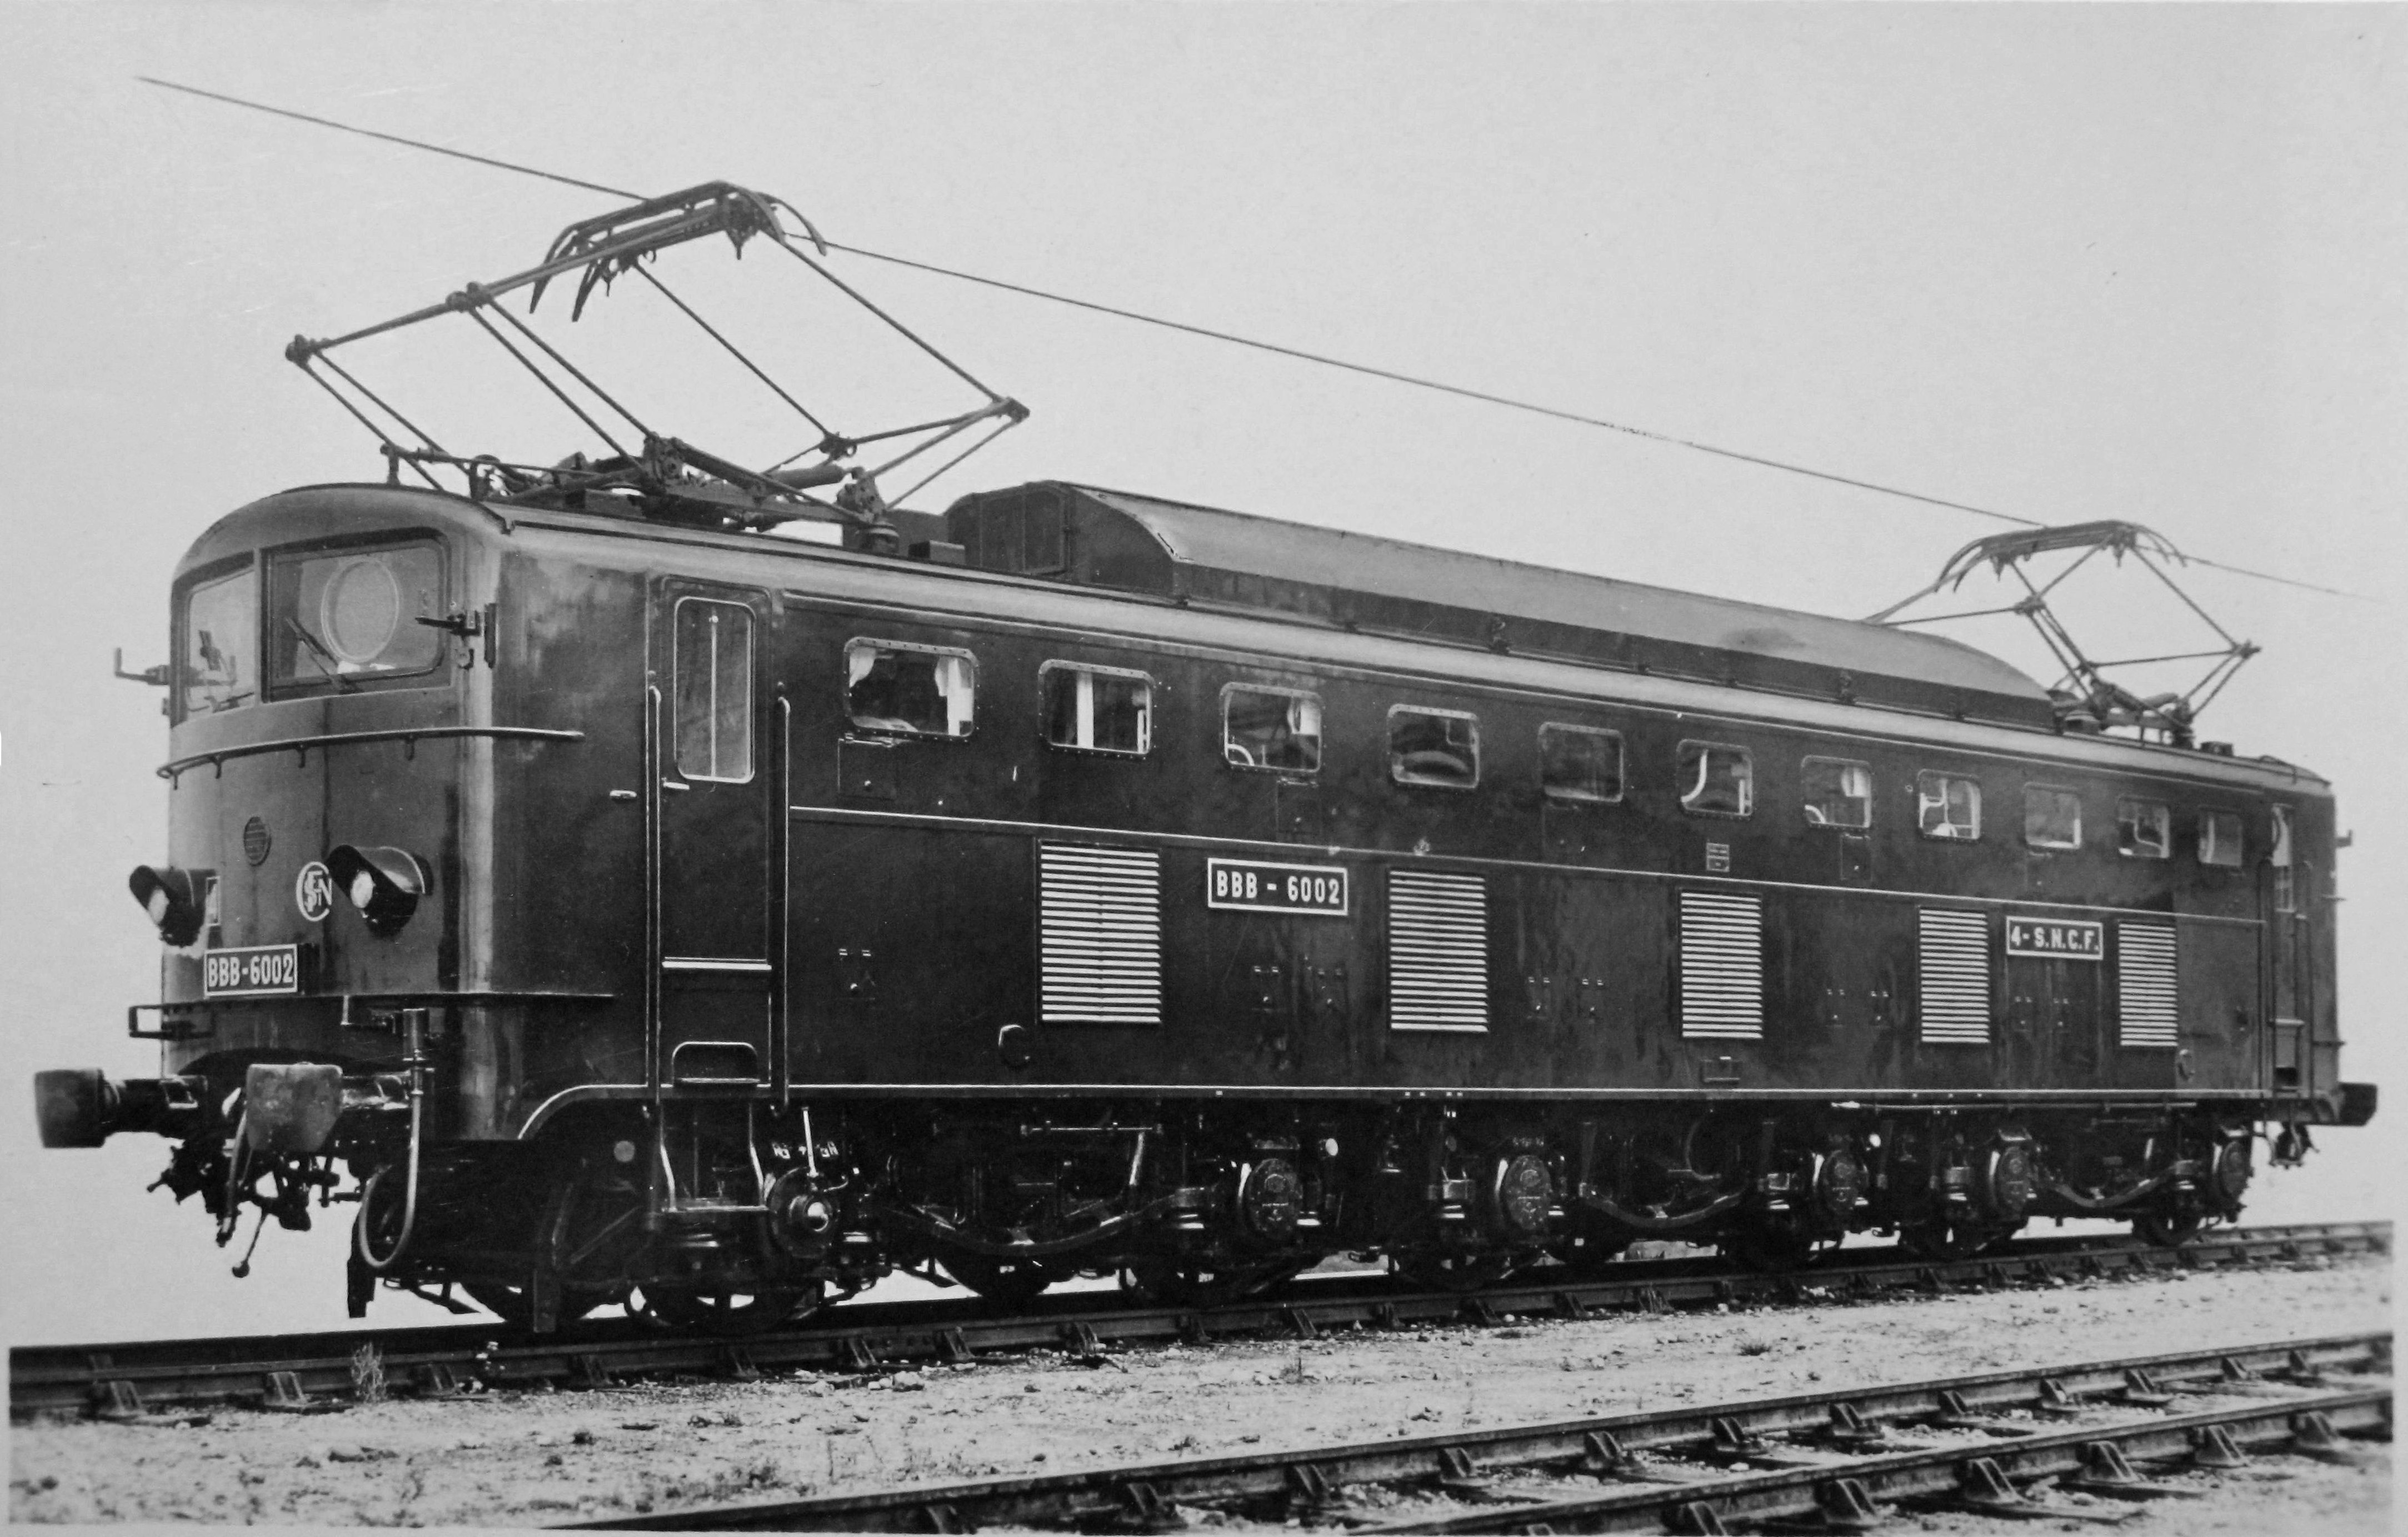 [HFR160] Plaques de locomotives - Page 2 SNCF_BBB_6002